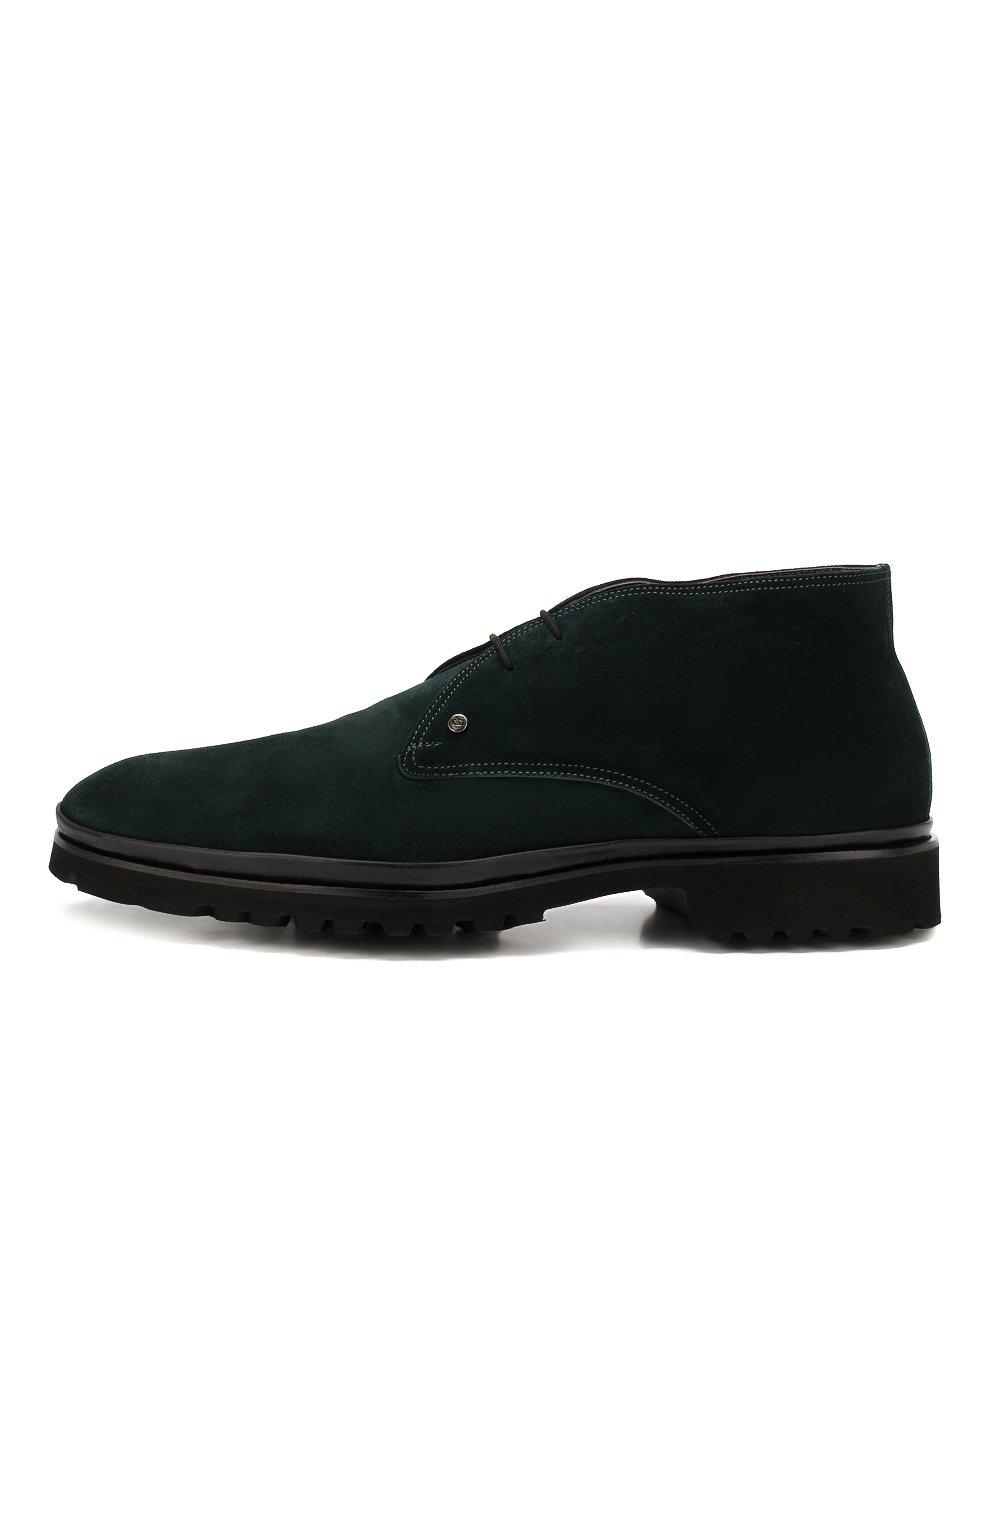 Мужские замшевые ботинки ALDO BRUE темно-зеленого цвета, арт. AB8514H-SA | Фото 3